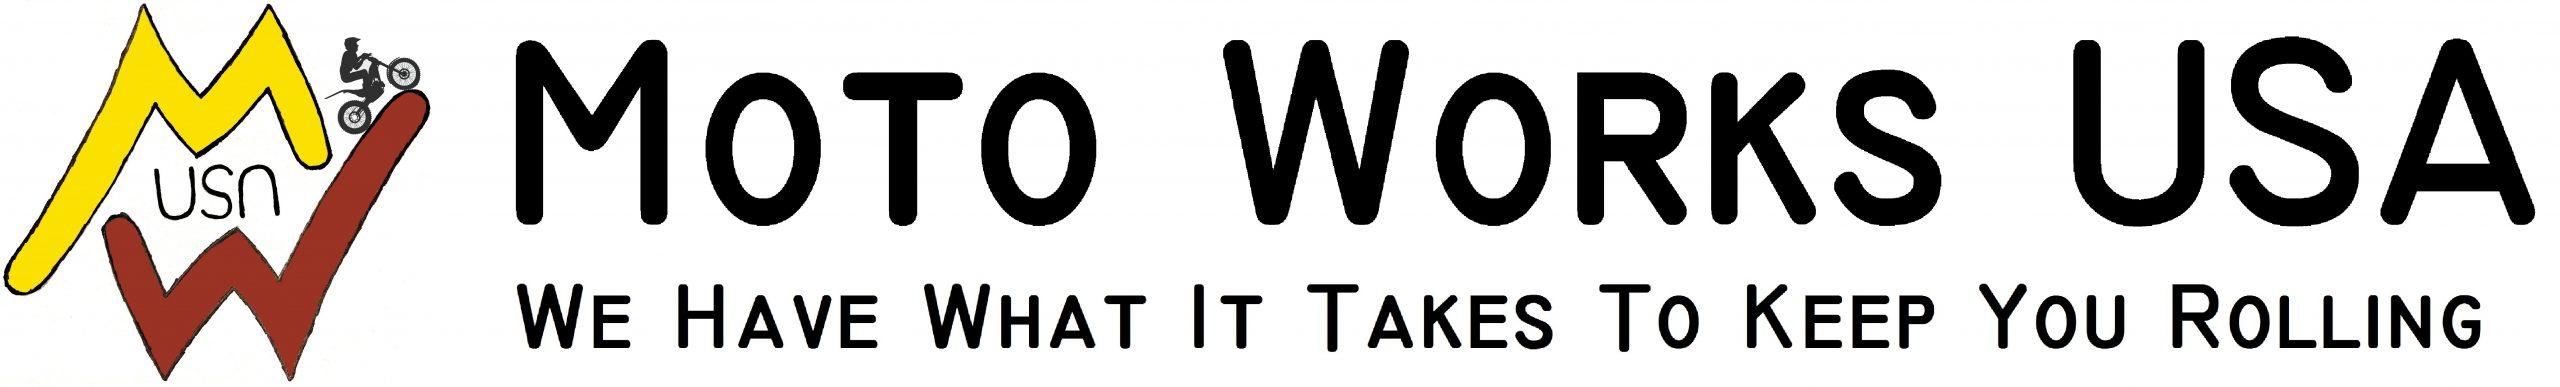 Moto Works USA